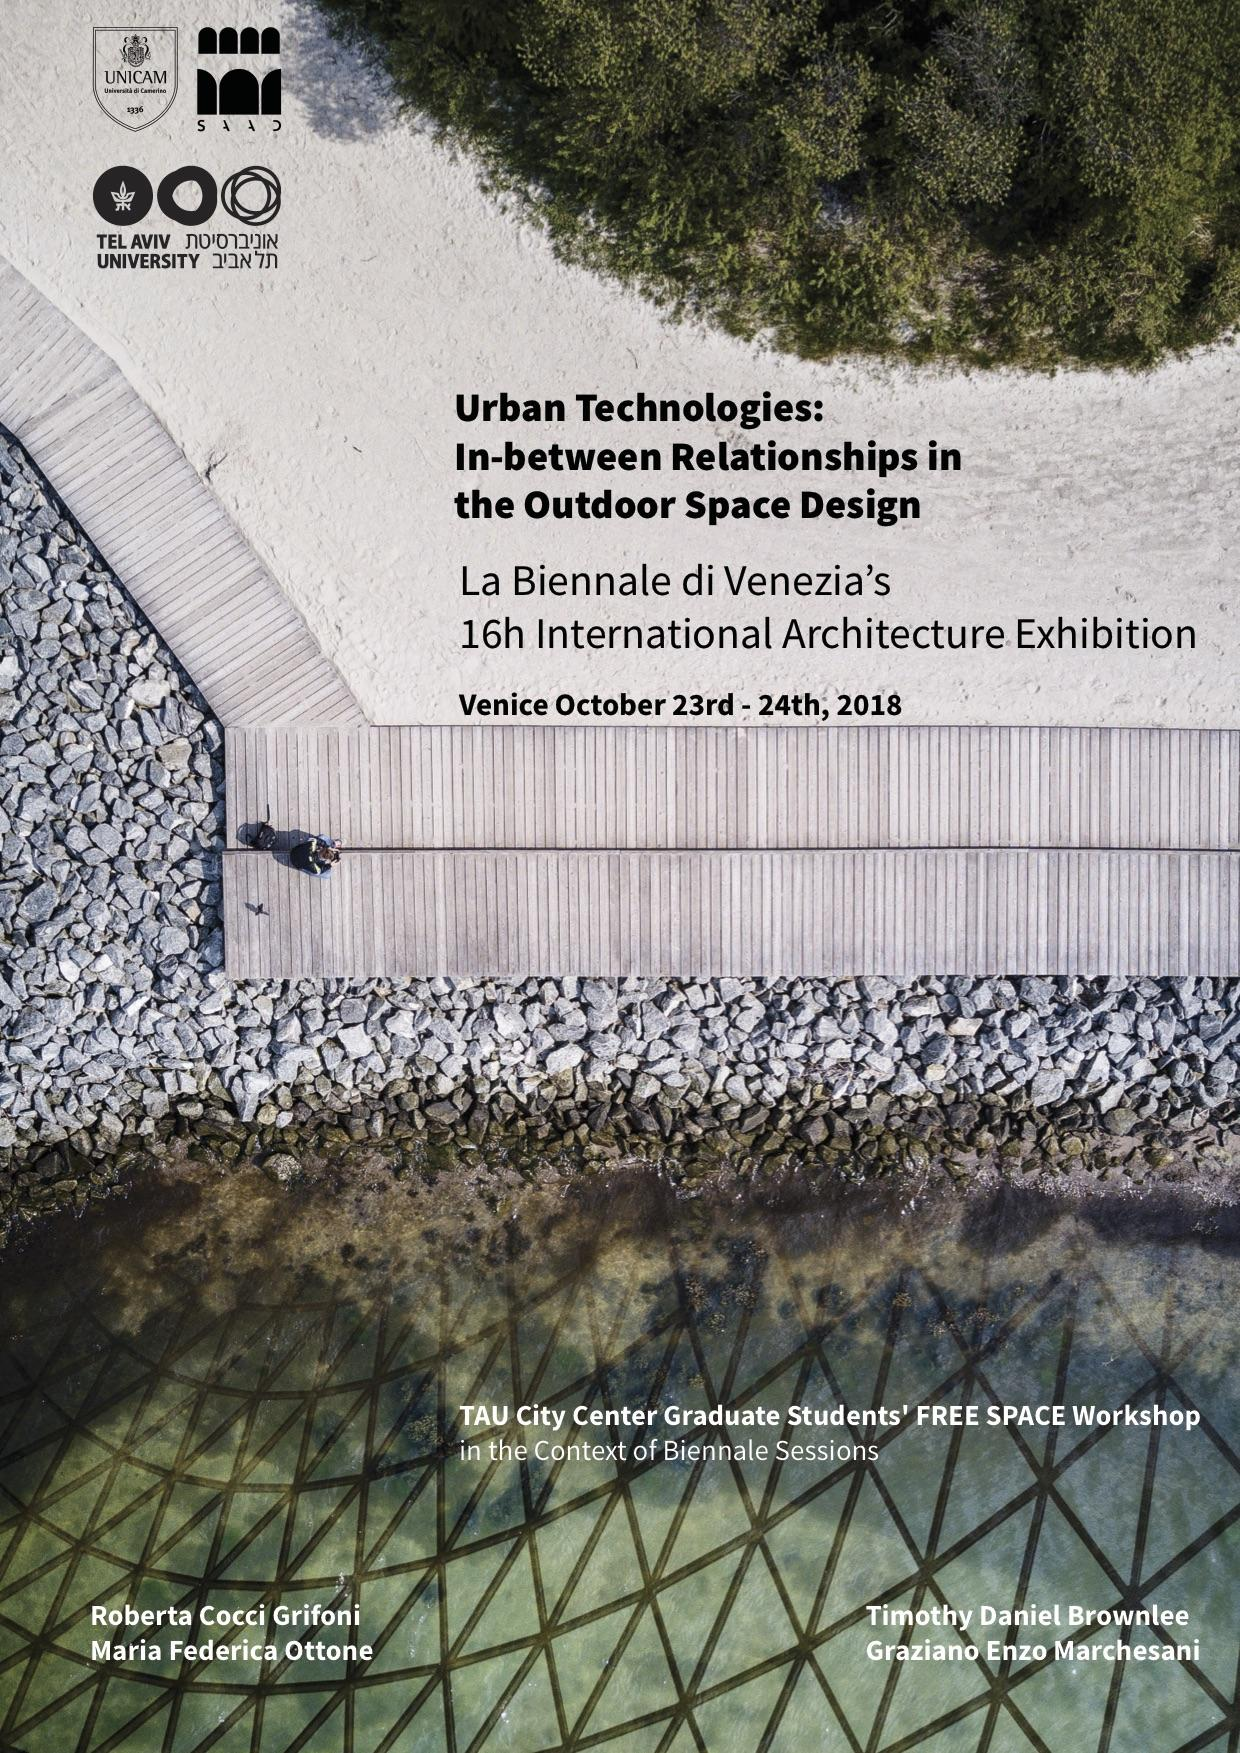 saad scuola architettura saad urban technologies